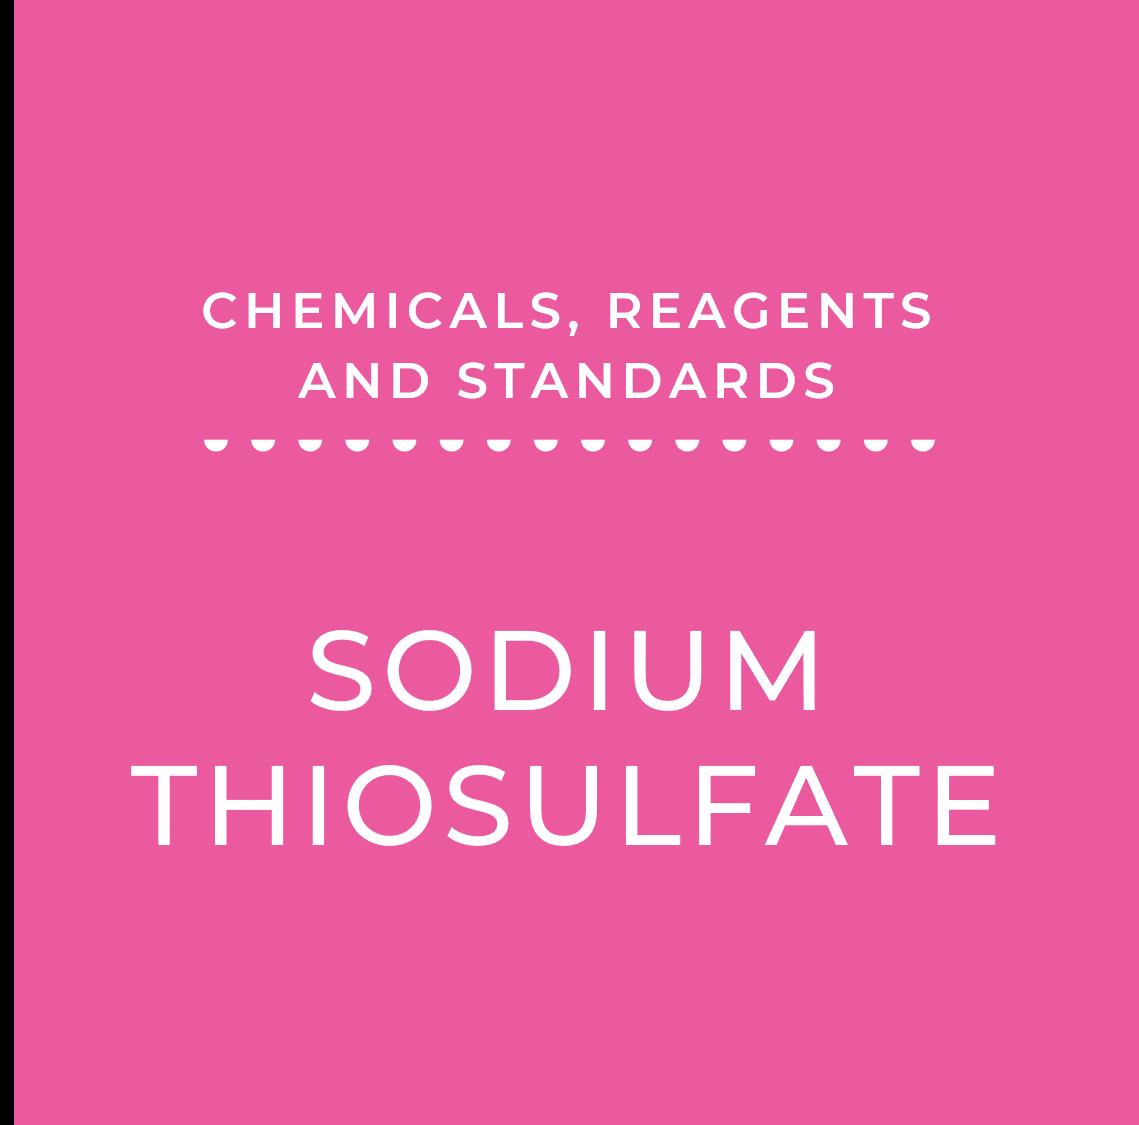 0.02 N Sodium Thiosulfate